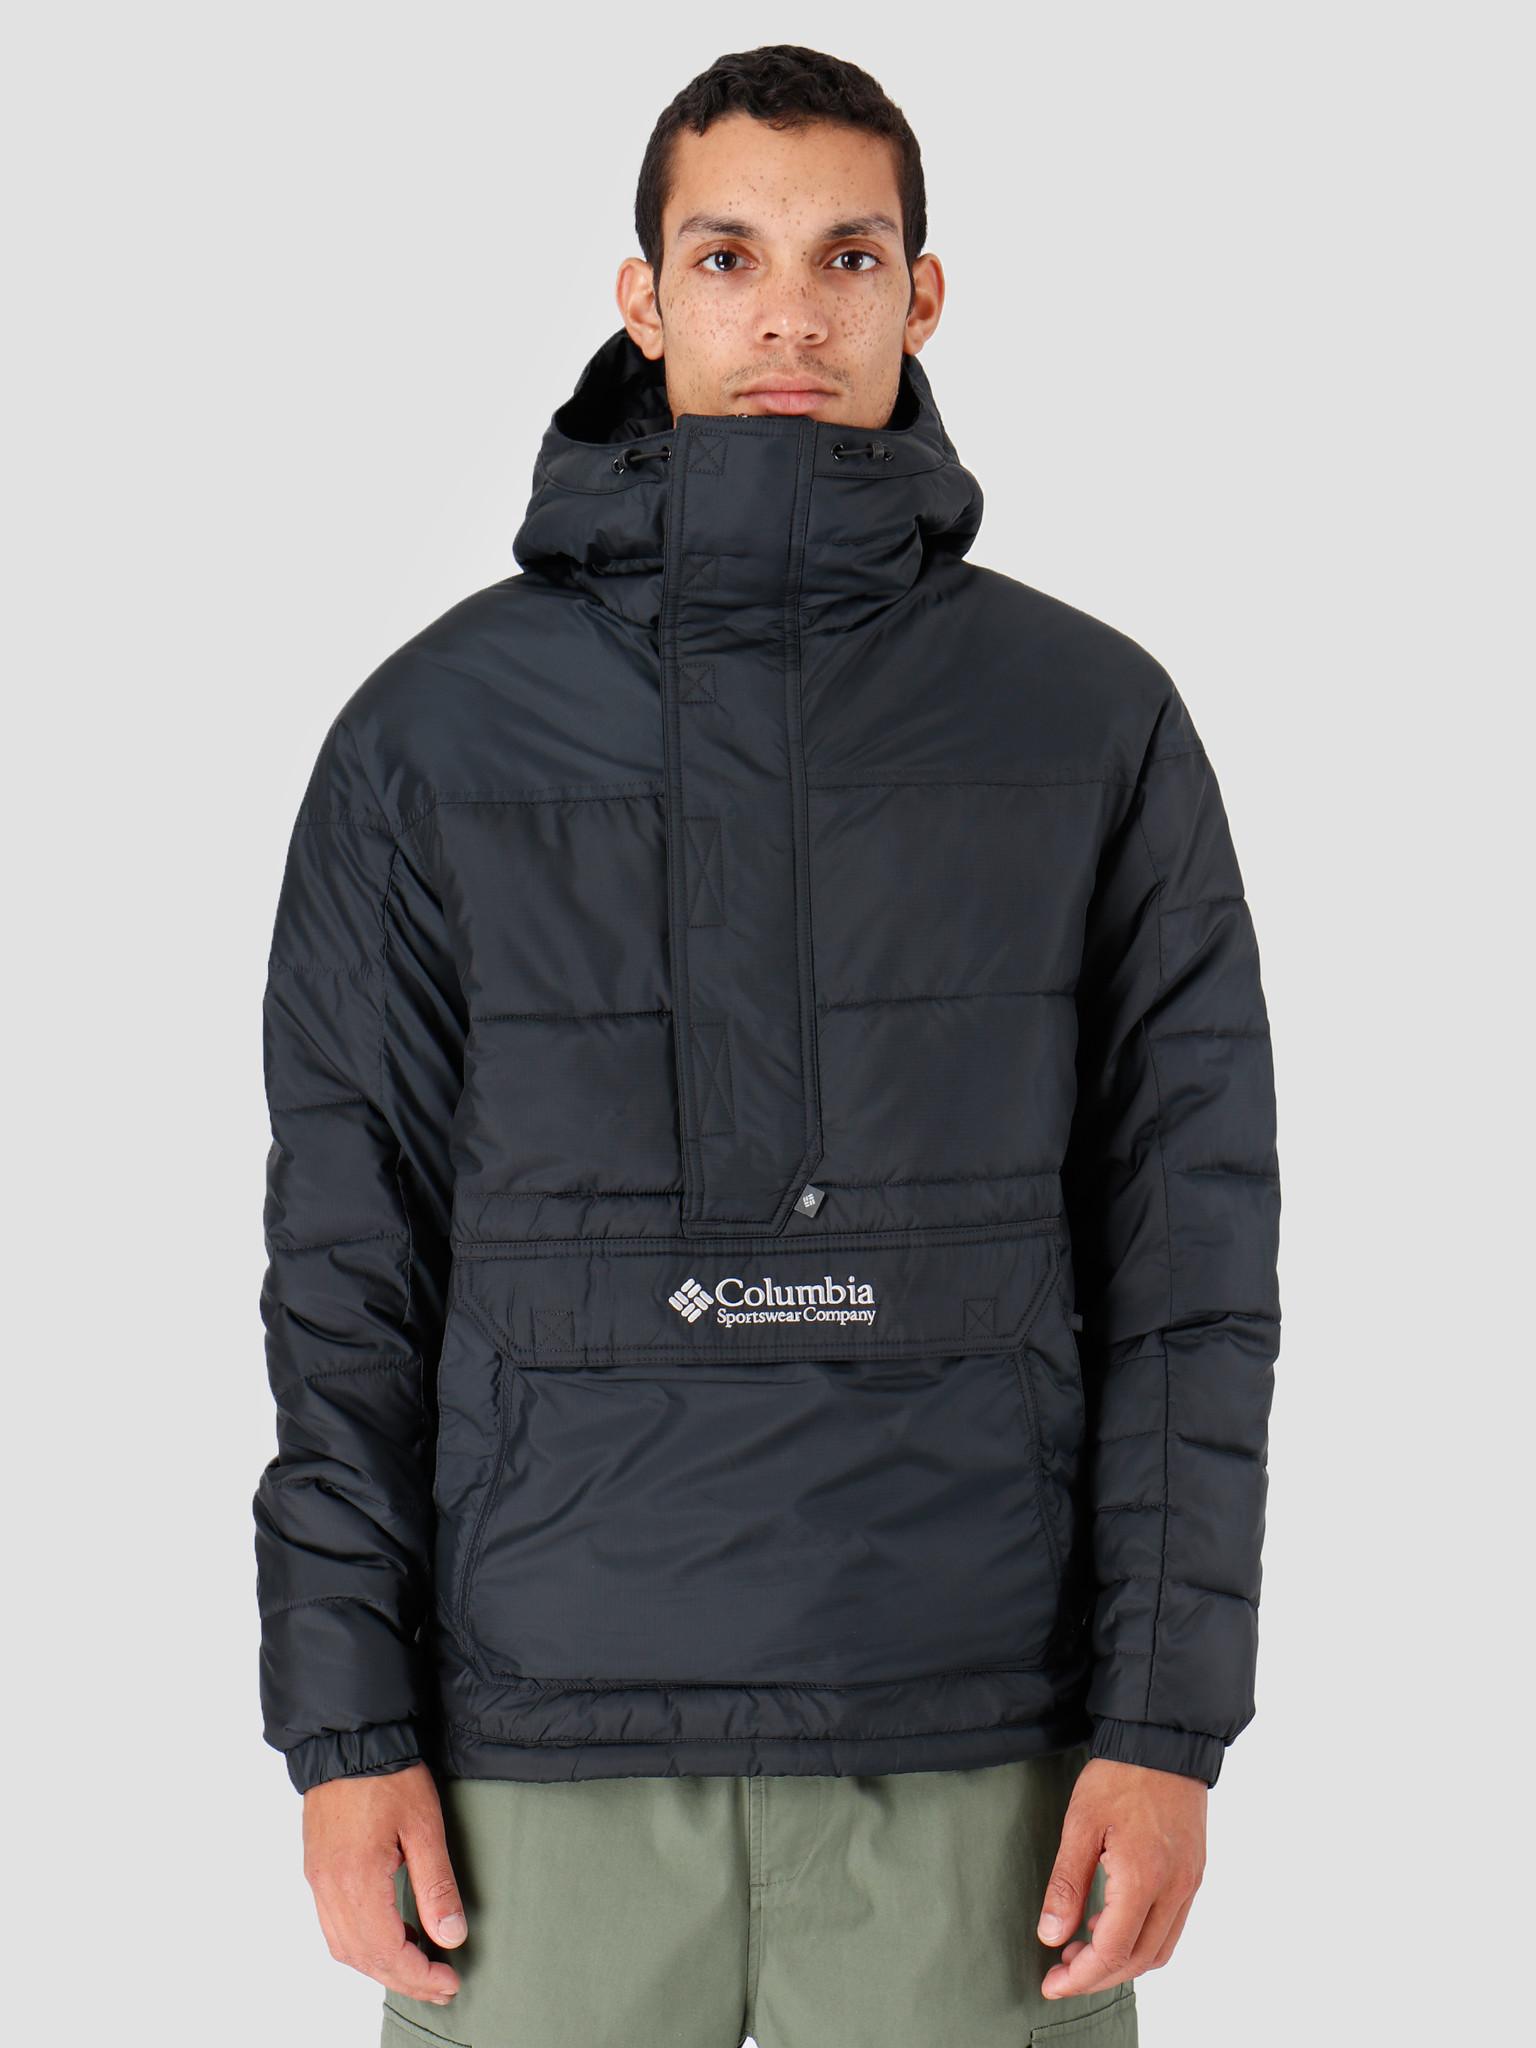 Columbia Columbia Lodge Pullover Jacket Black 1864422010